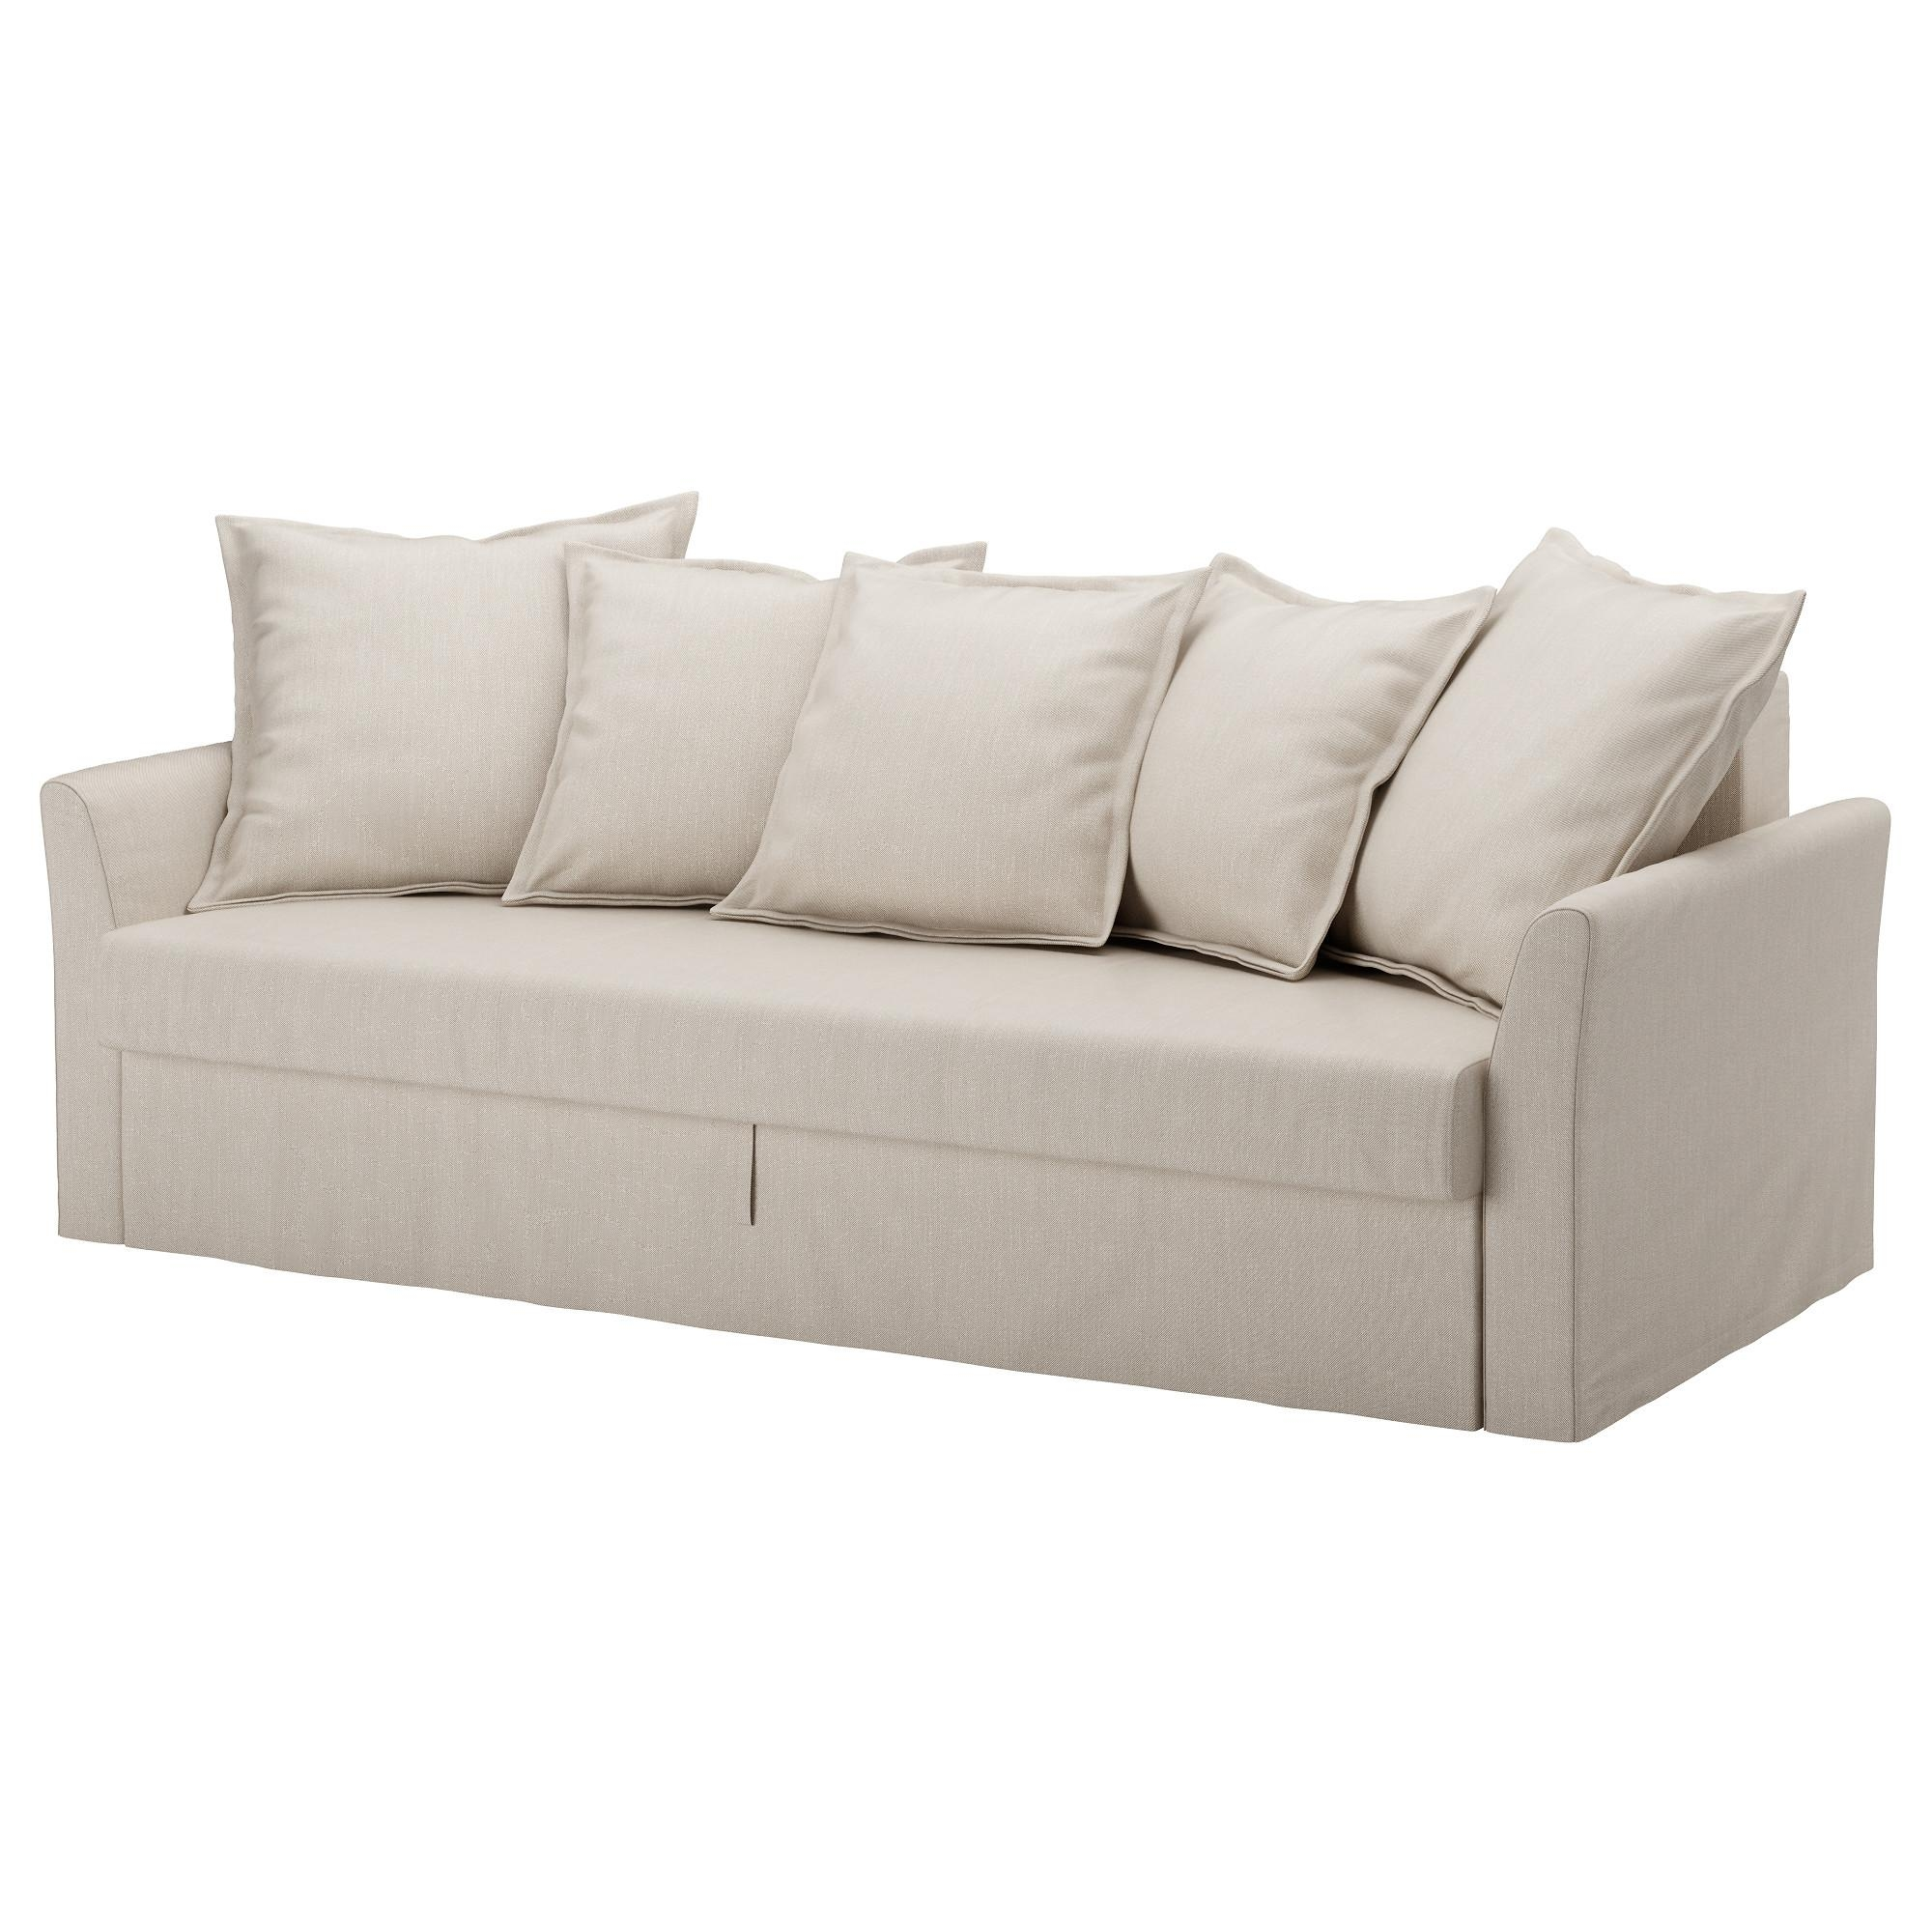 sears furniture sofas ikea uk 20 best ideas sofa